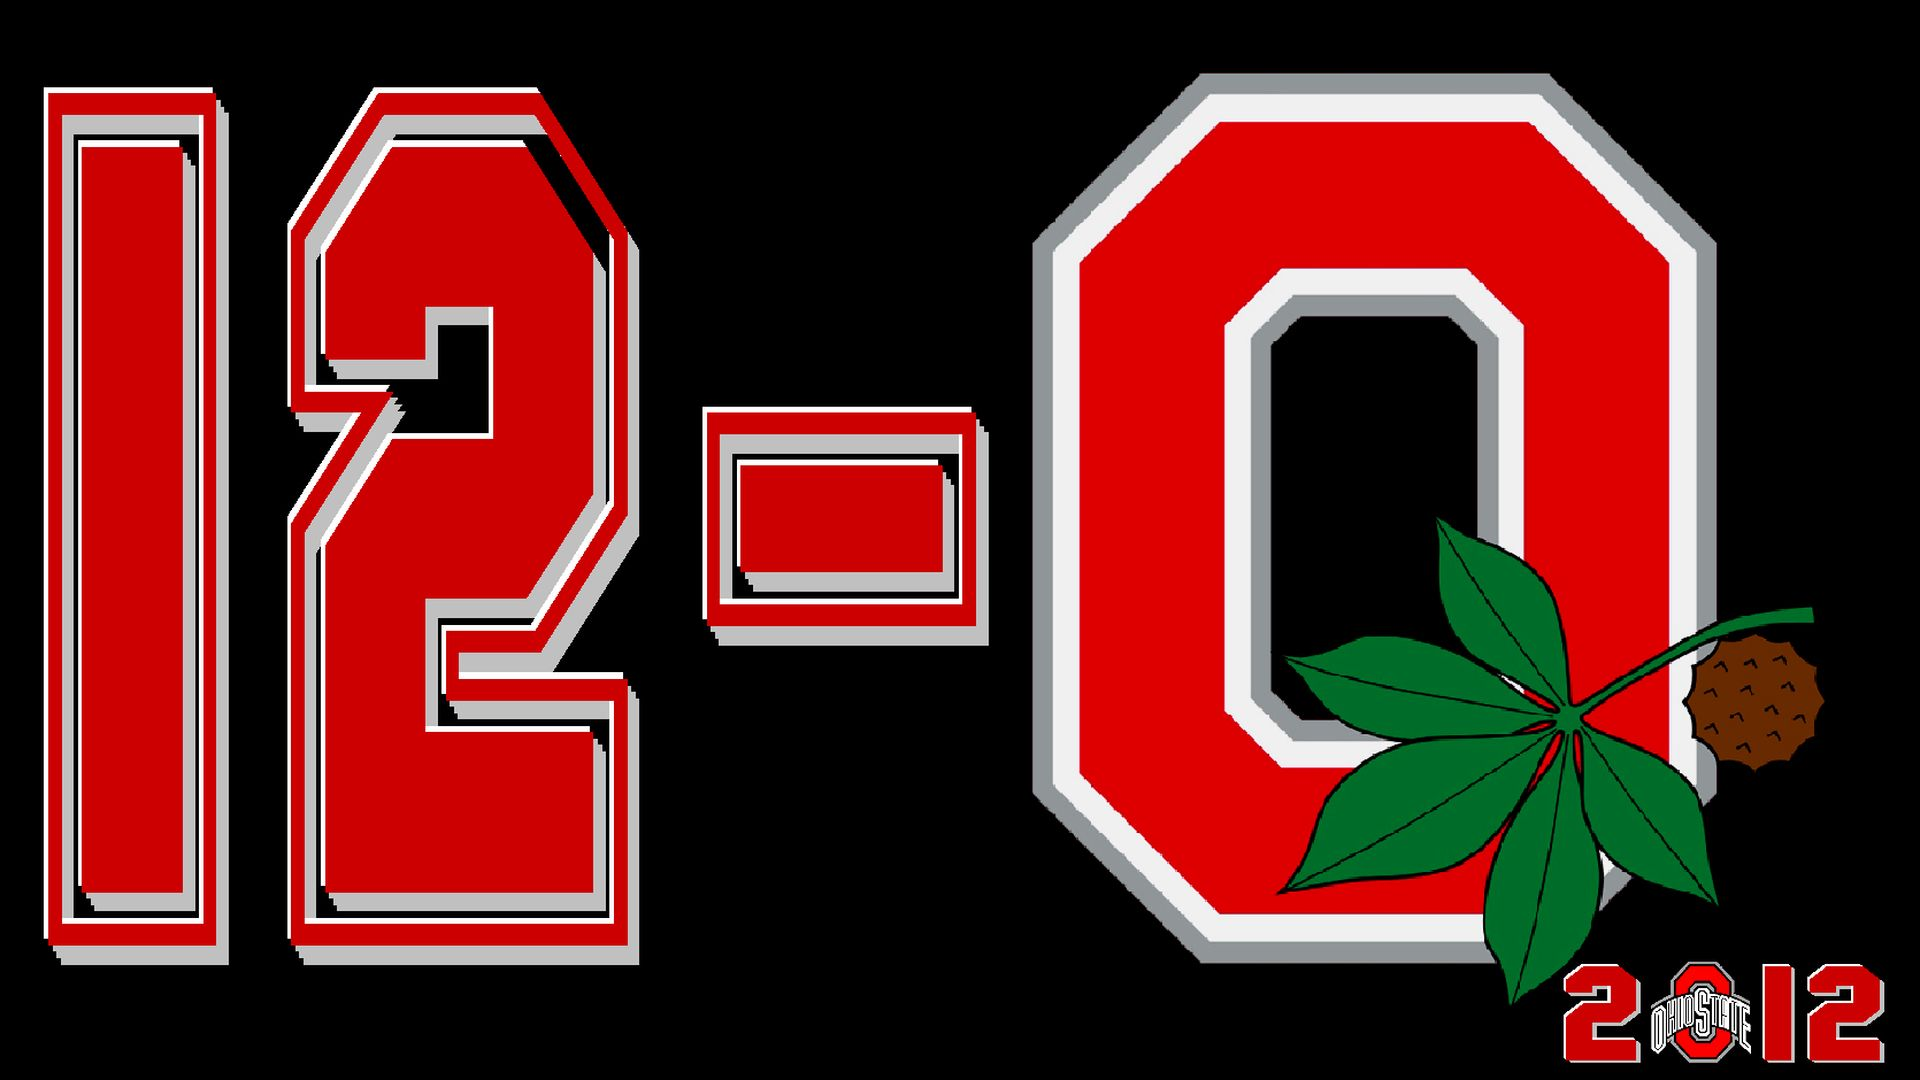 2012 Undefeated season Ohio state football, Ohio state